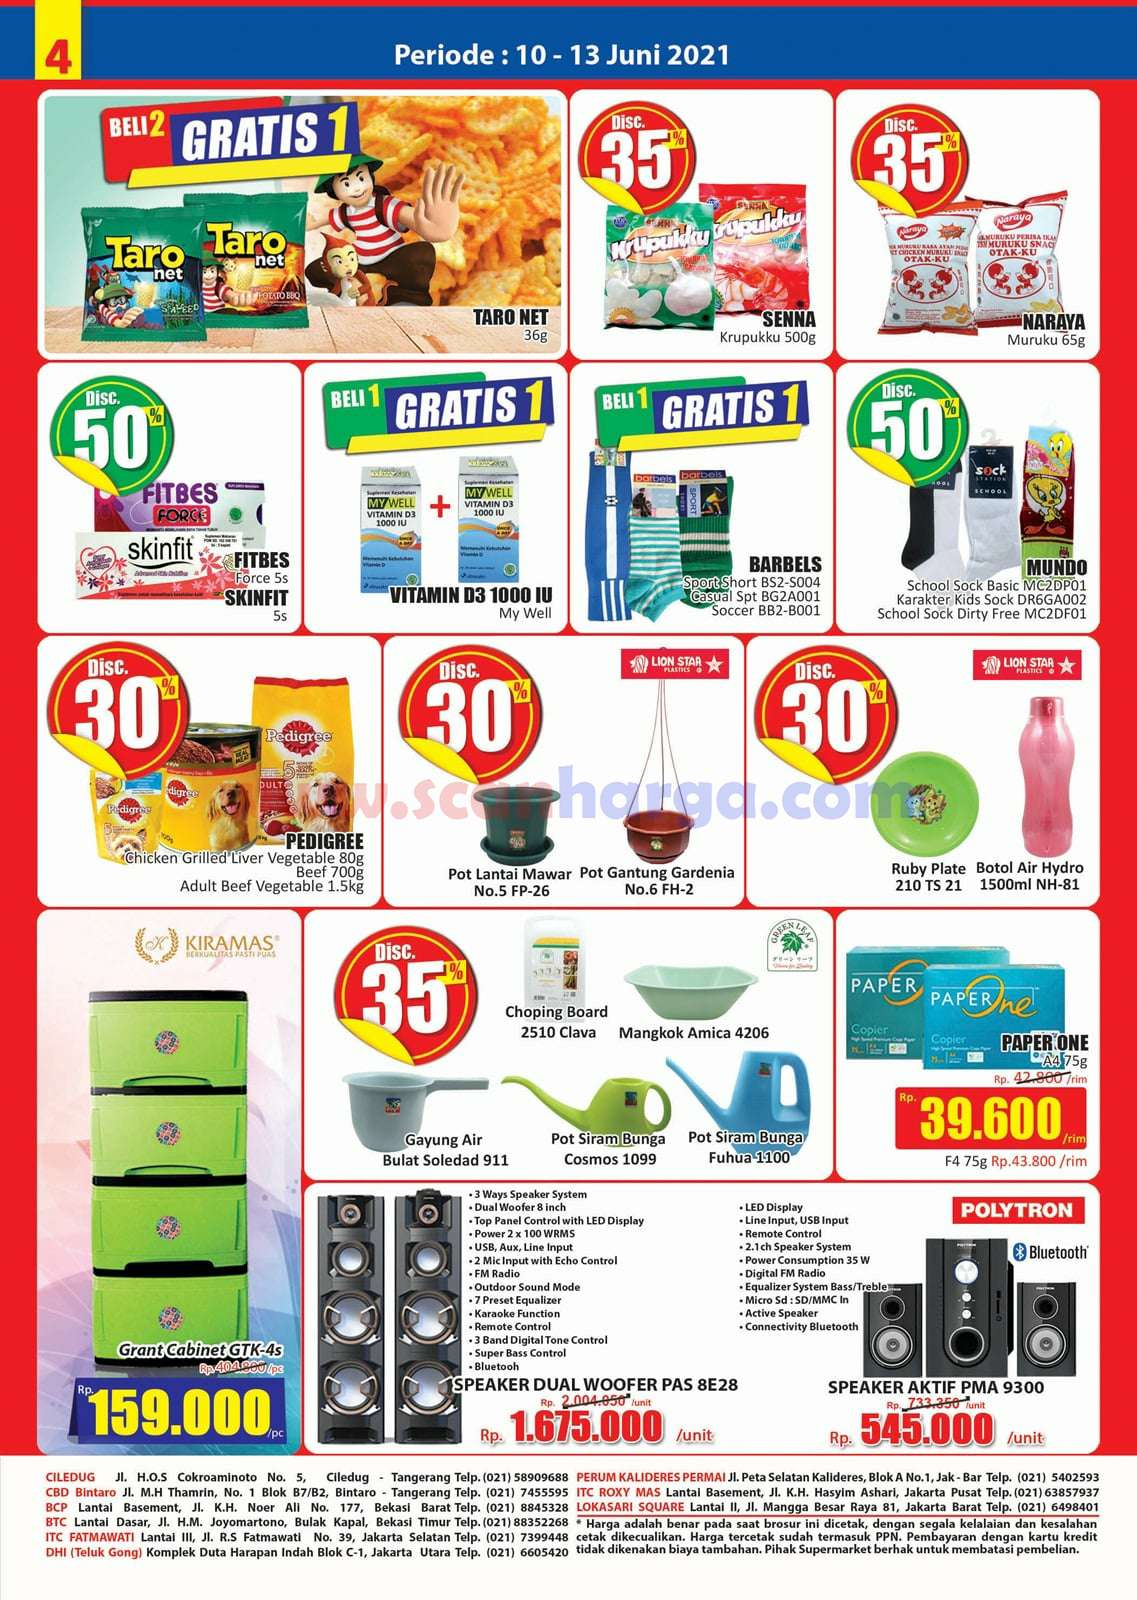 Katalog Promo JSM Hari Hari Swalayan Weekend 10 - 13 Juni 2021 4